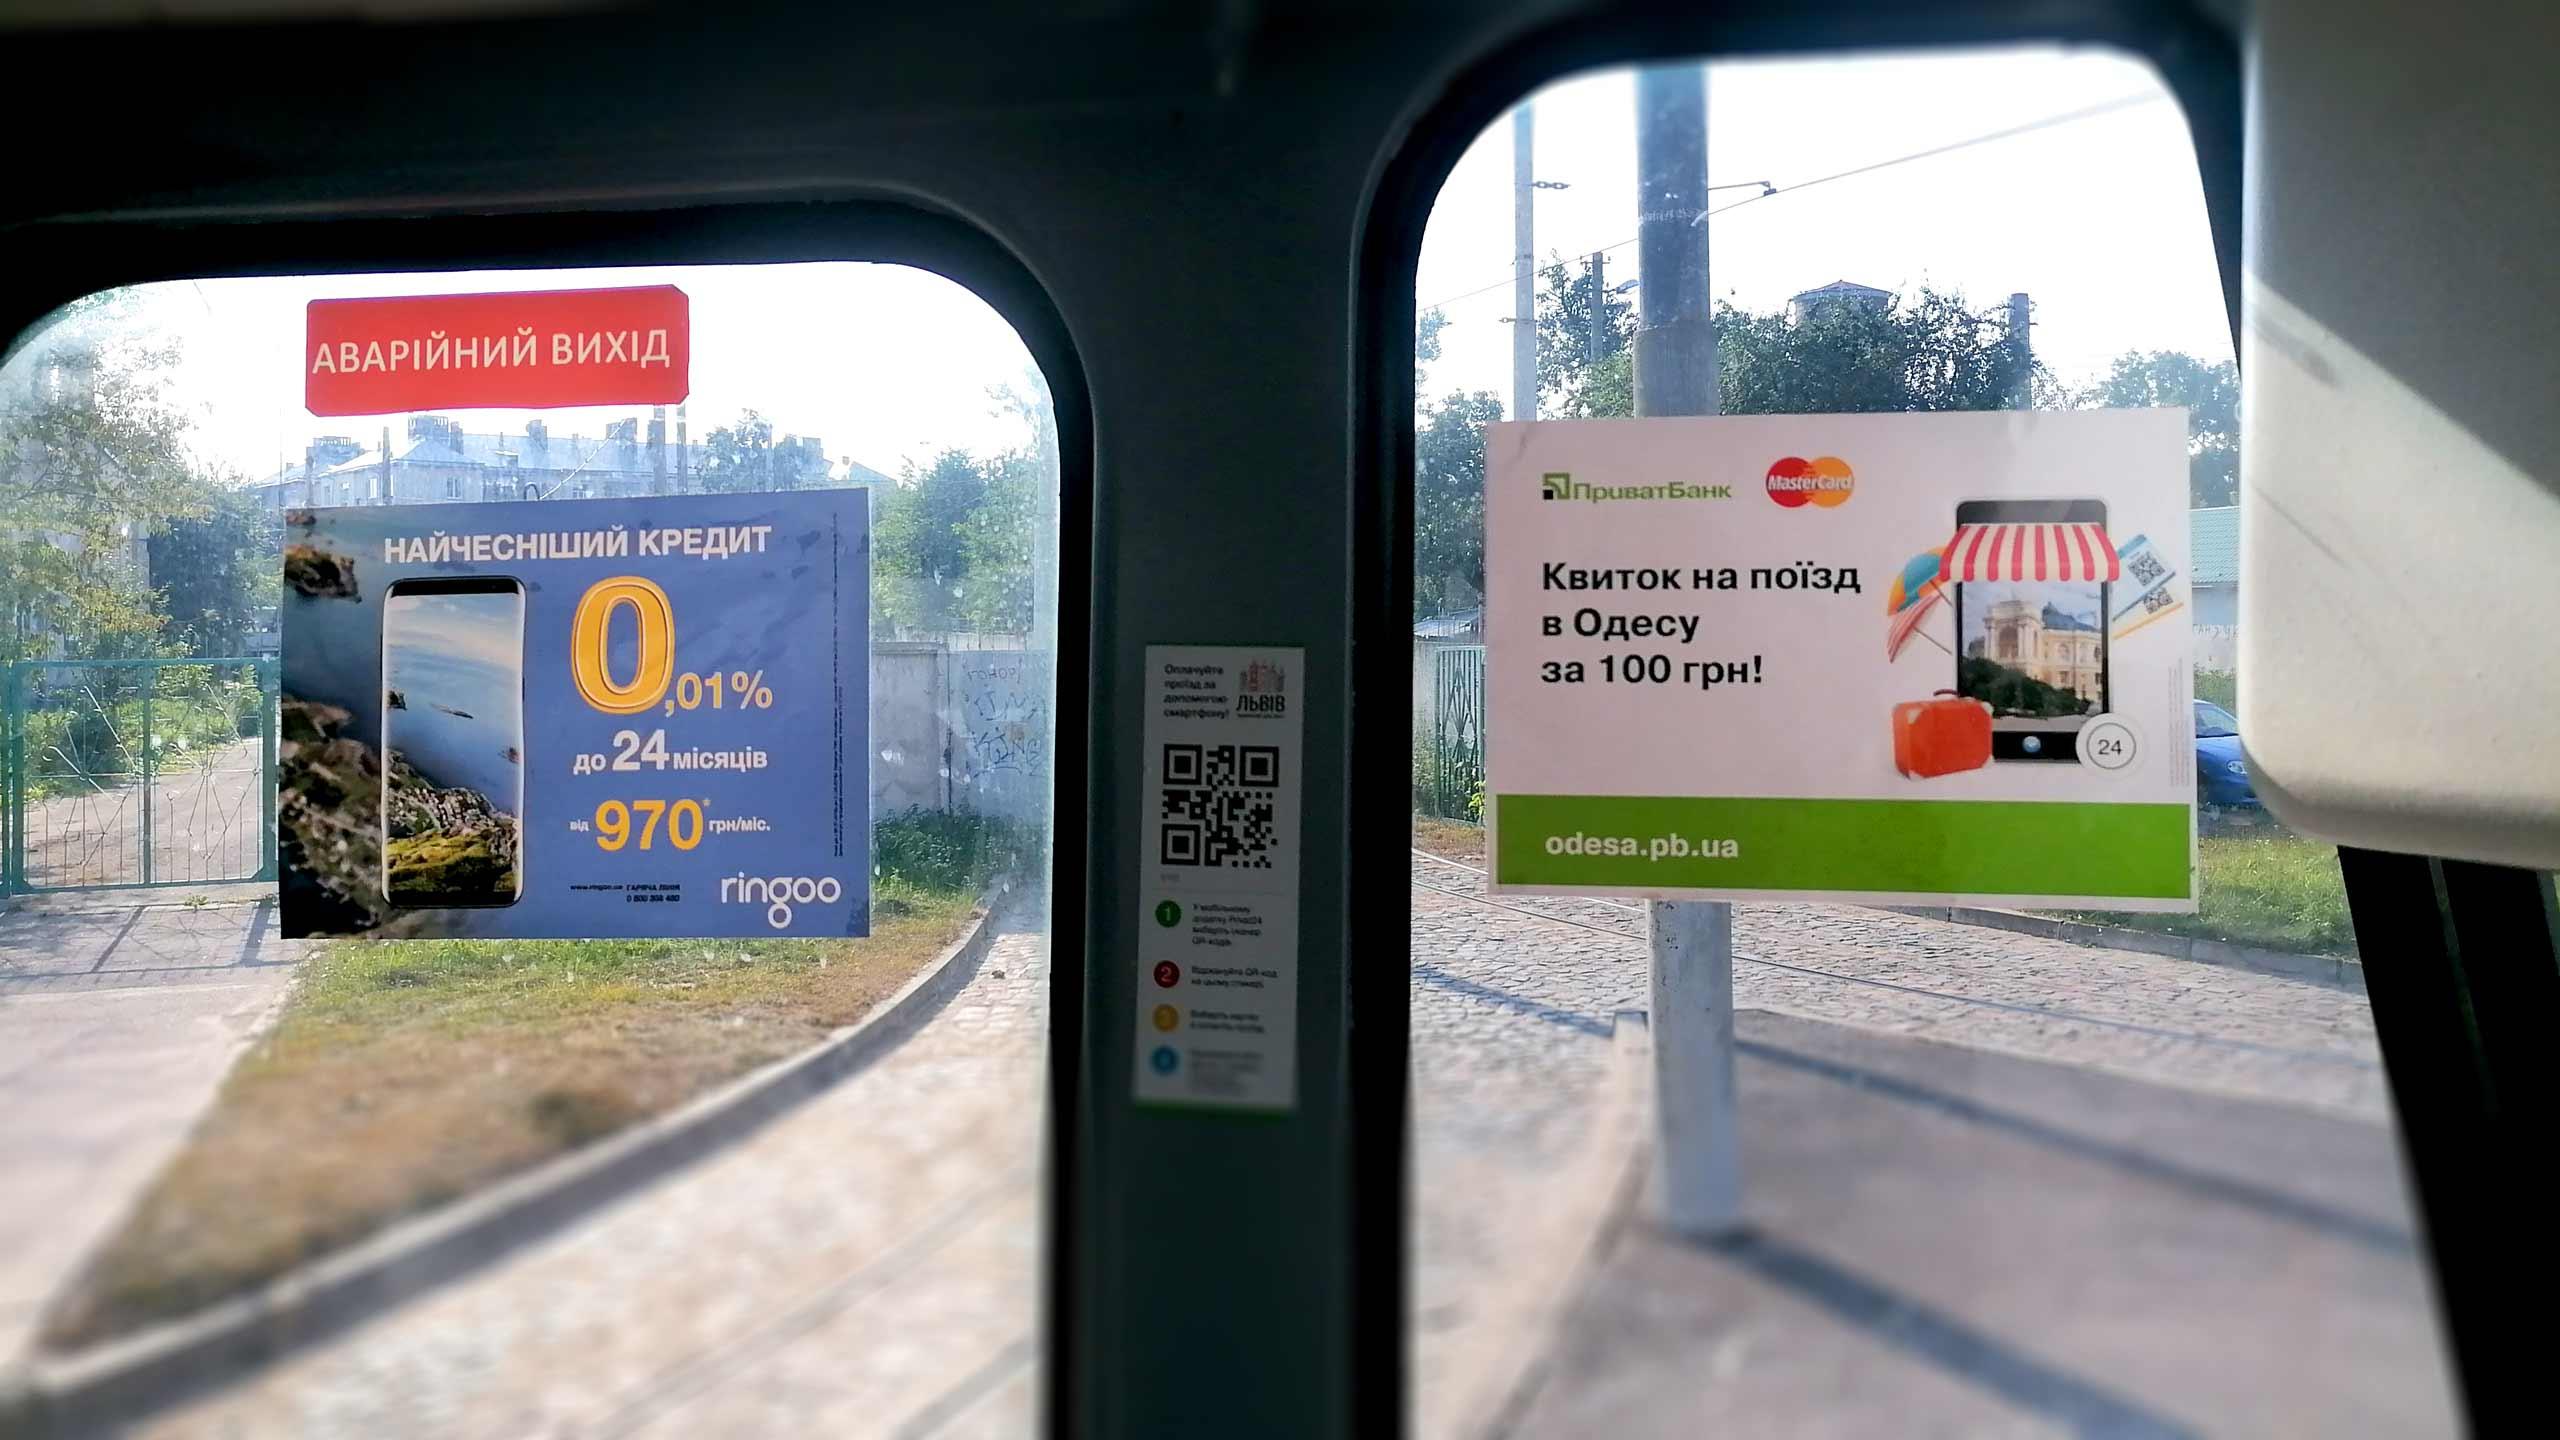 Реклама в трамваях Николаев